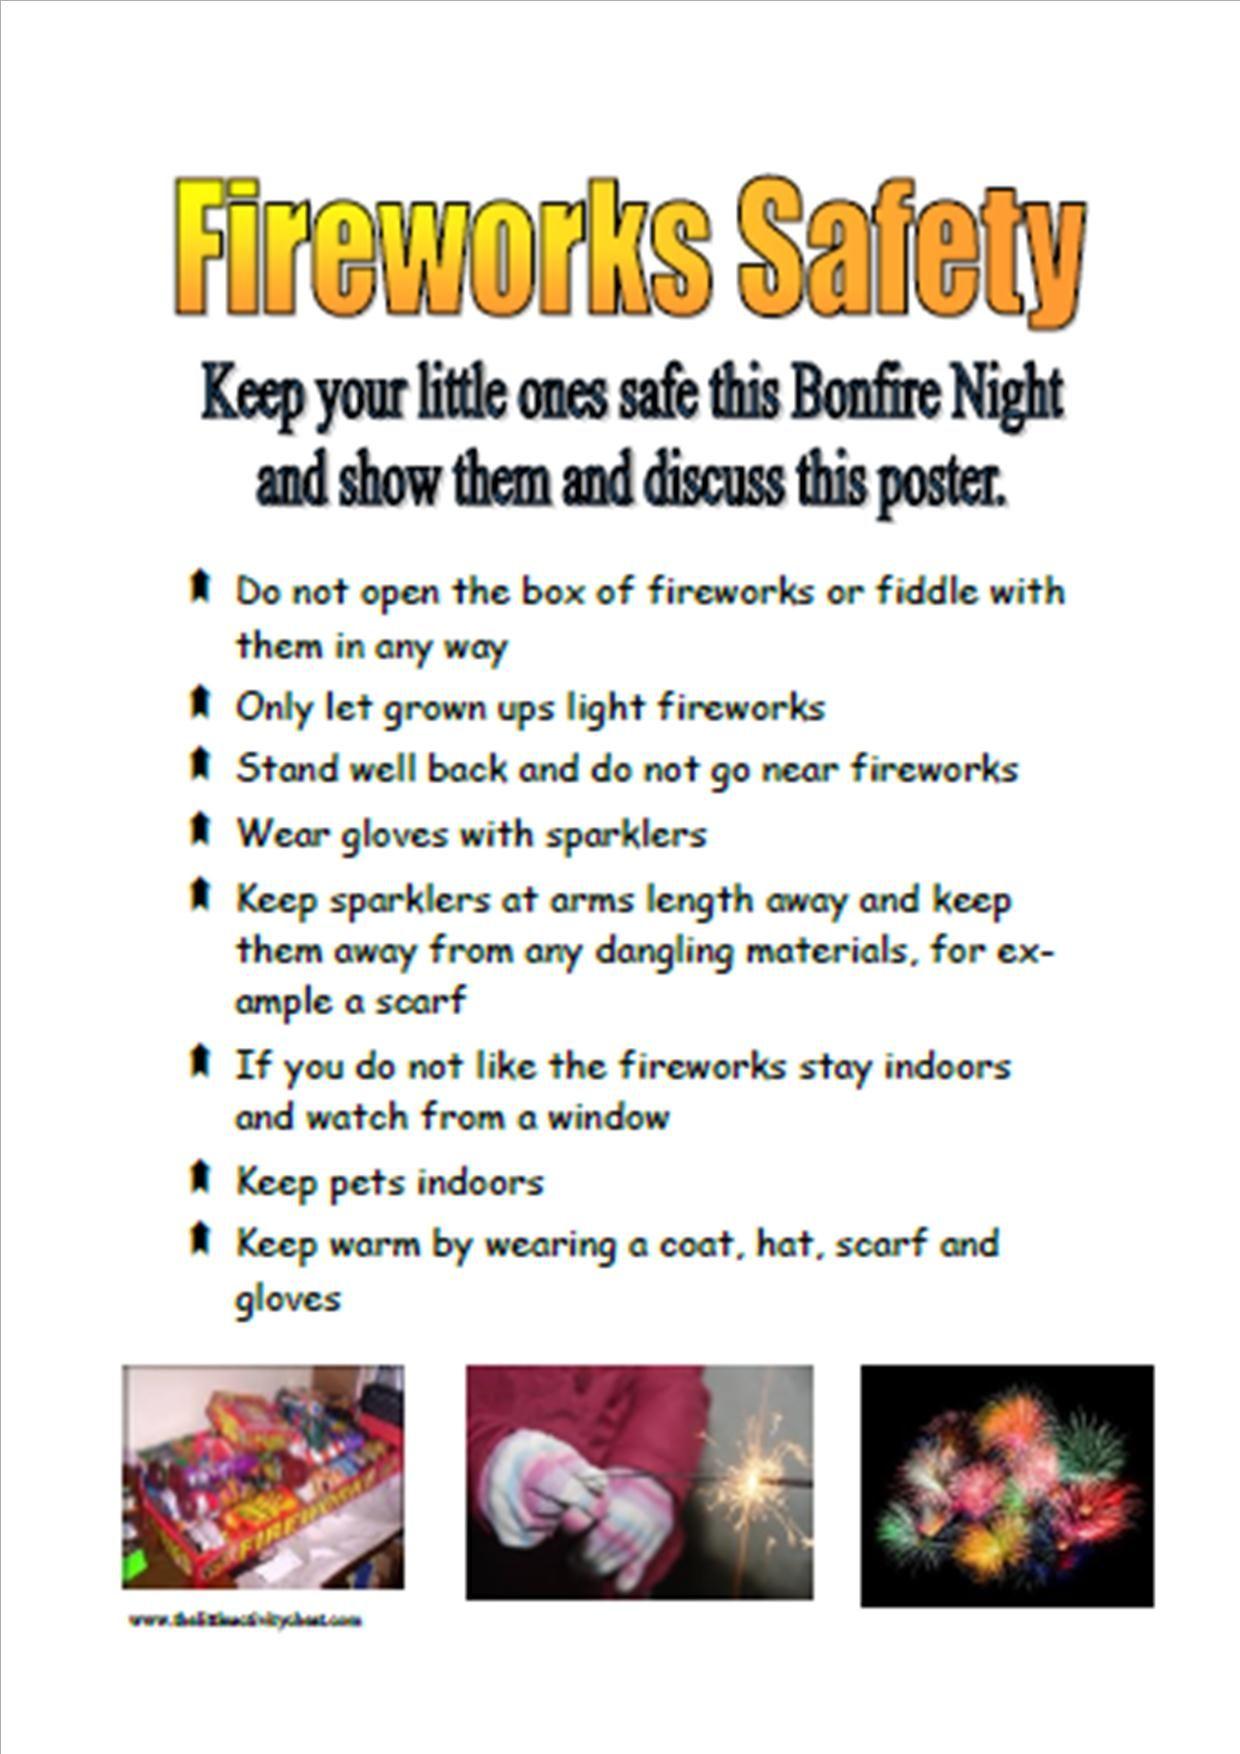 Firework Safety Poster Img